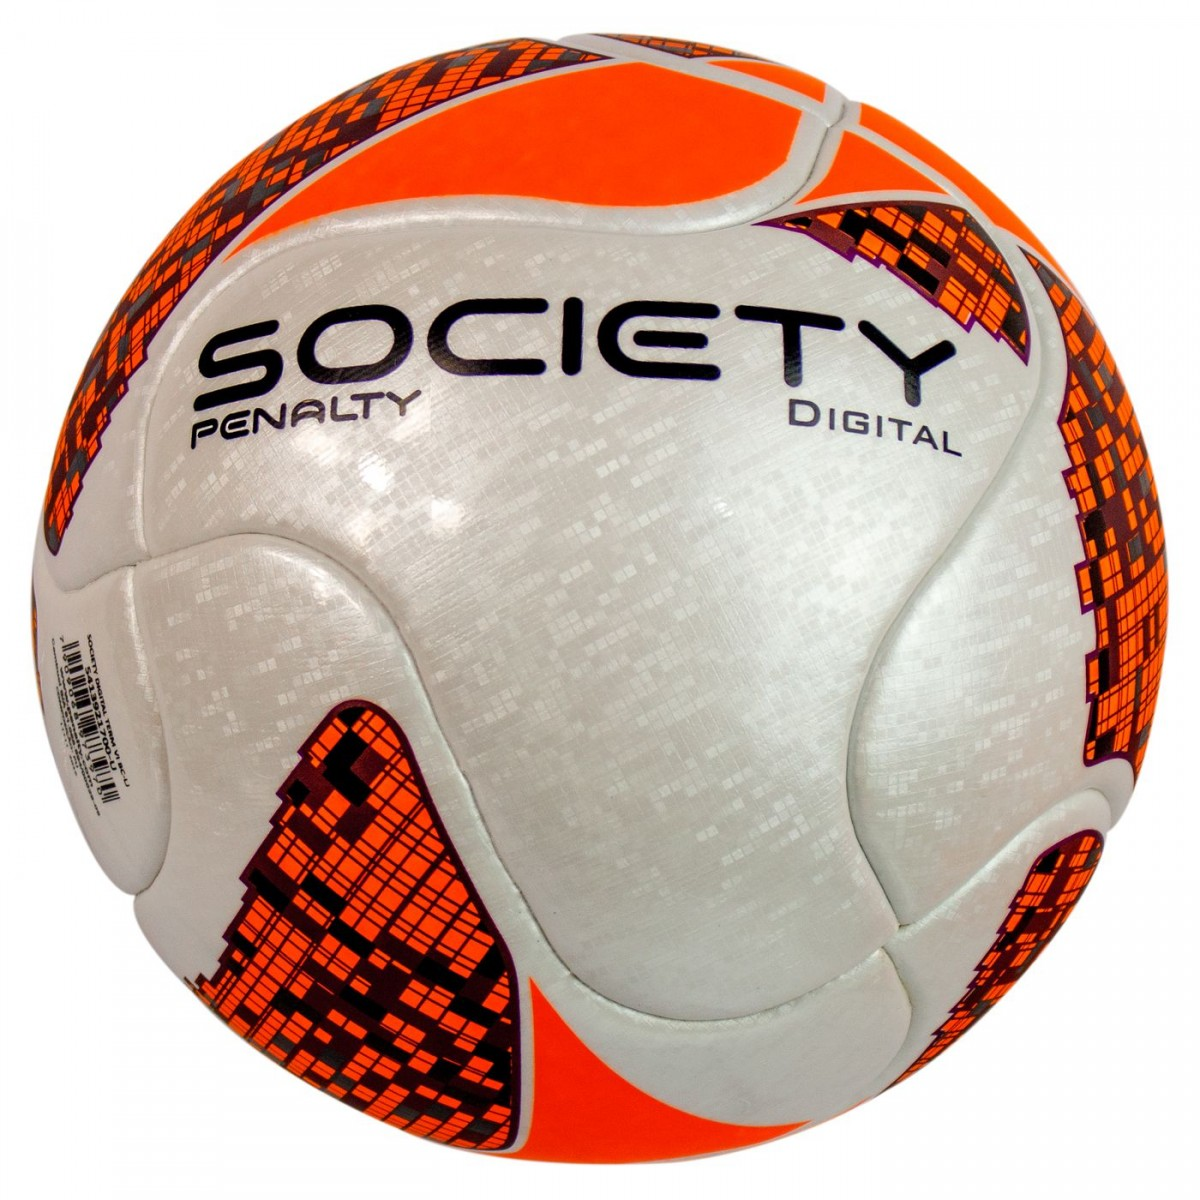 Bizz Store - Bola Society Penalty Digital Termotec Branca 7c76e9c7d6a3c